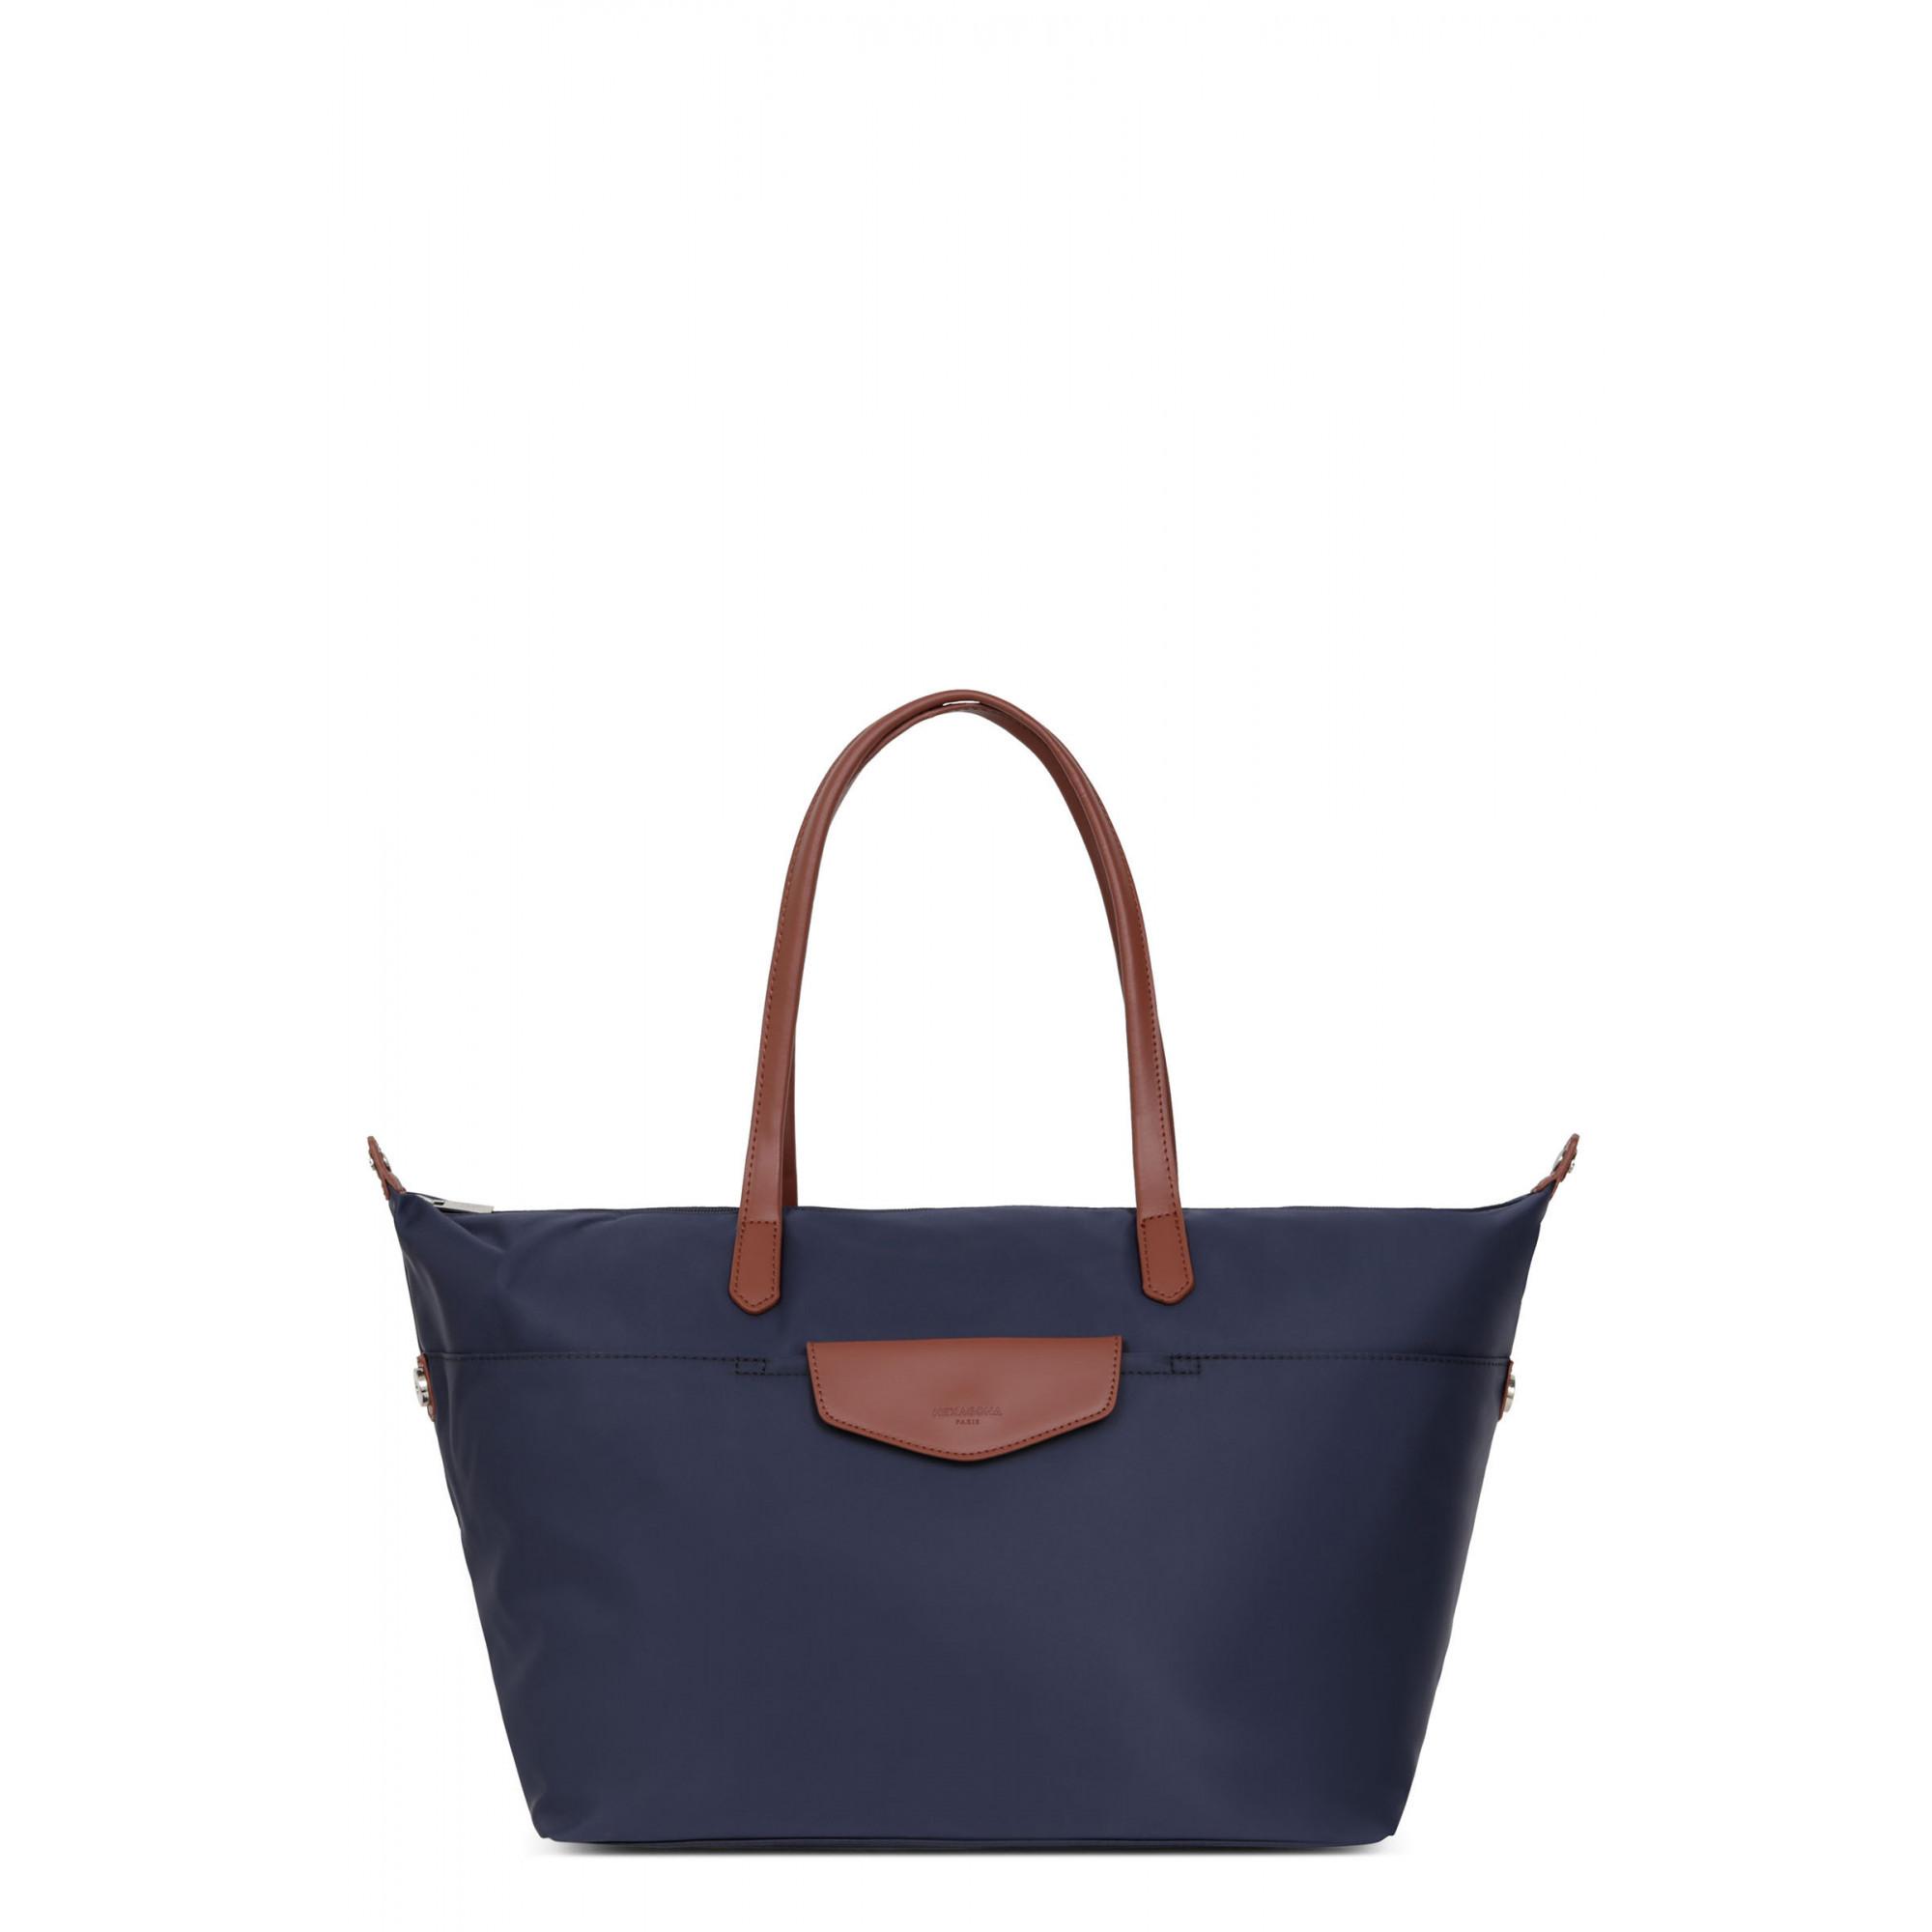 Travel Bag Navy - HEXAGONA